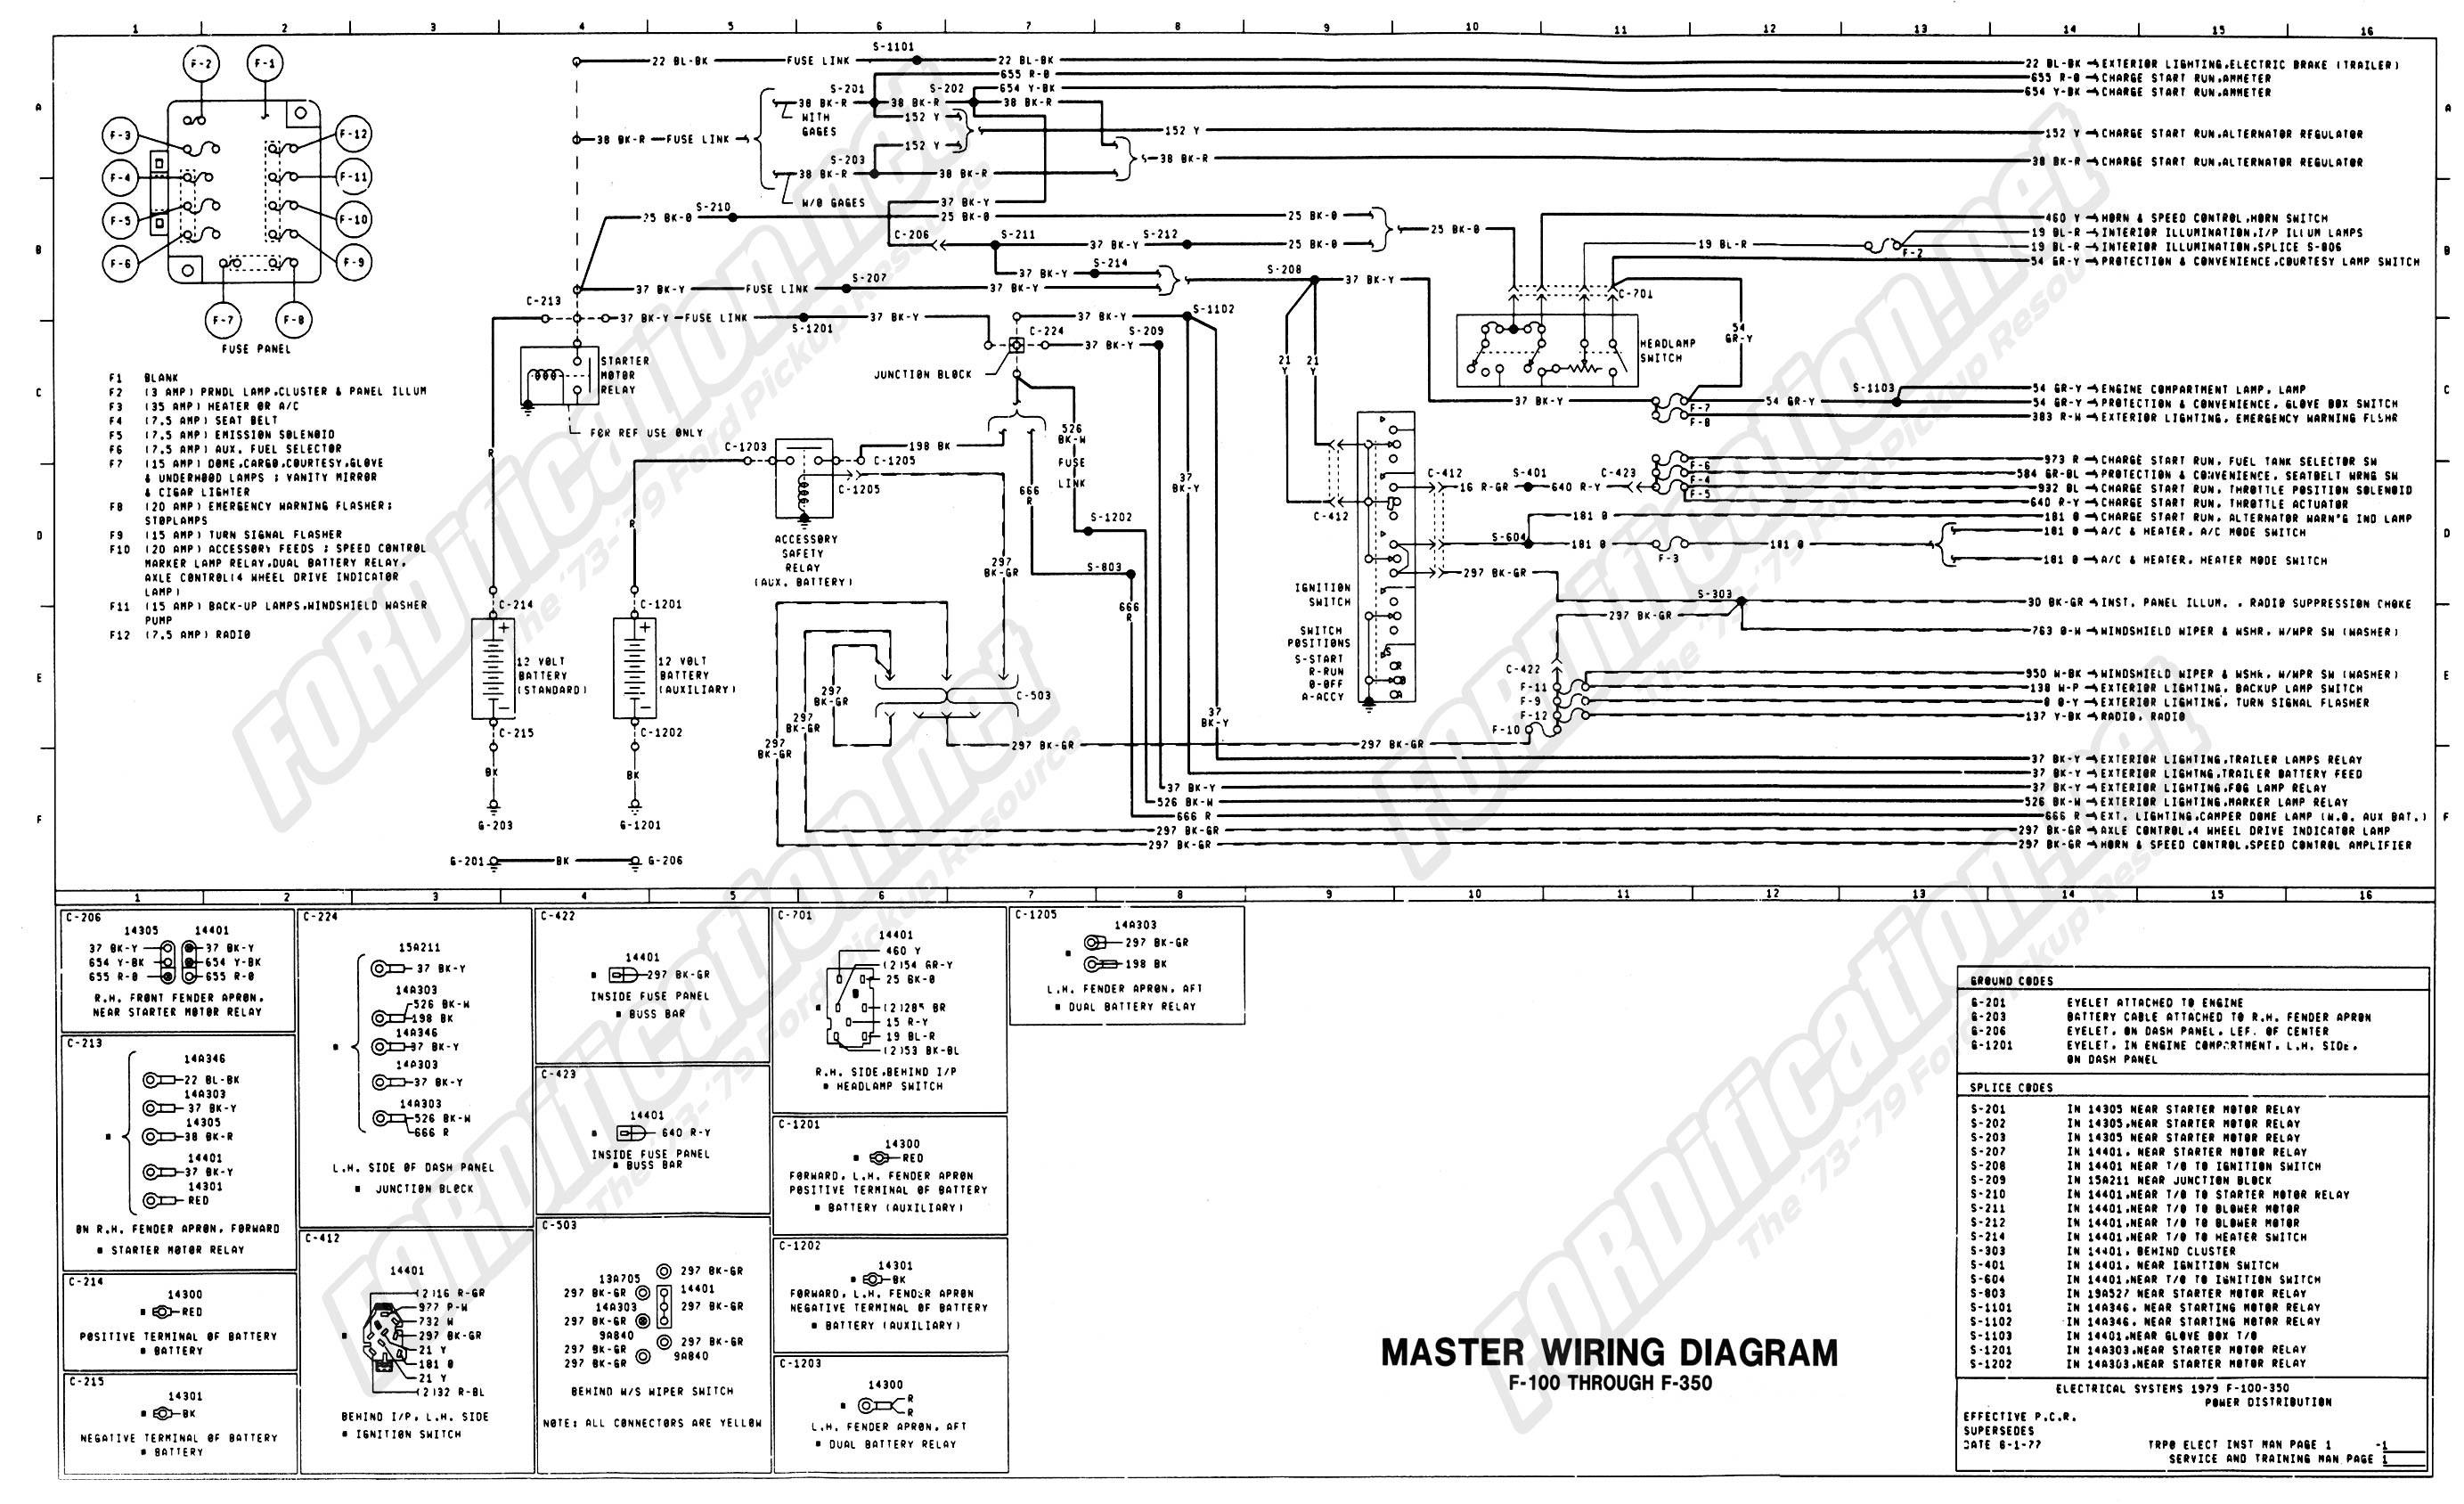 77 ford wire diagram wiring diagram schematic